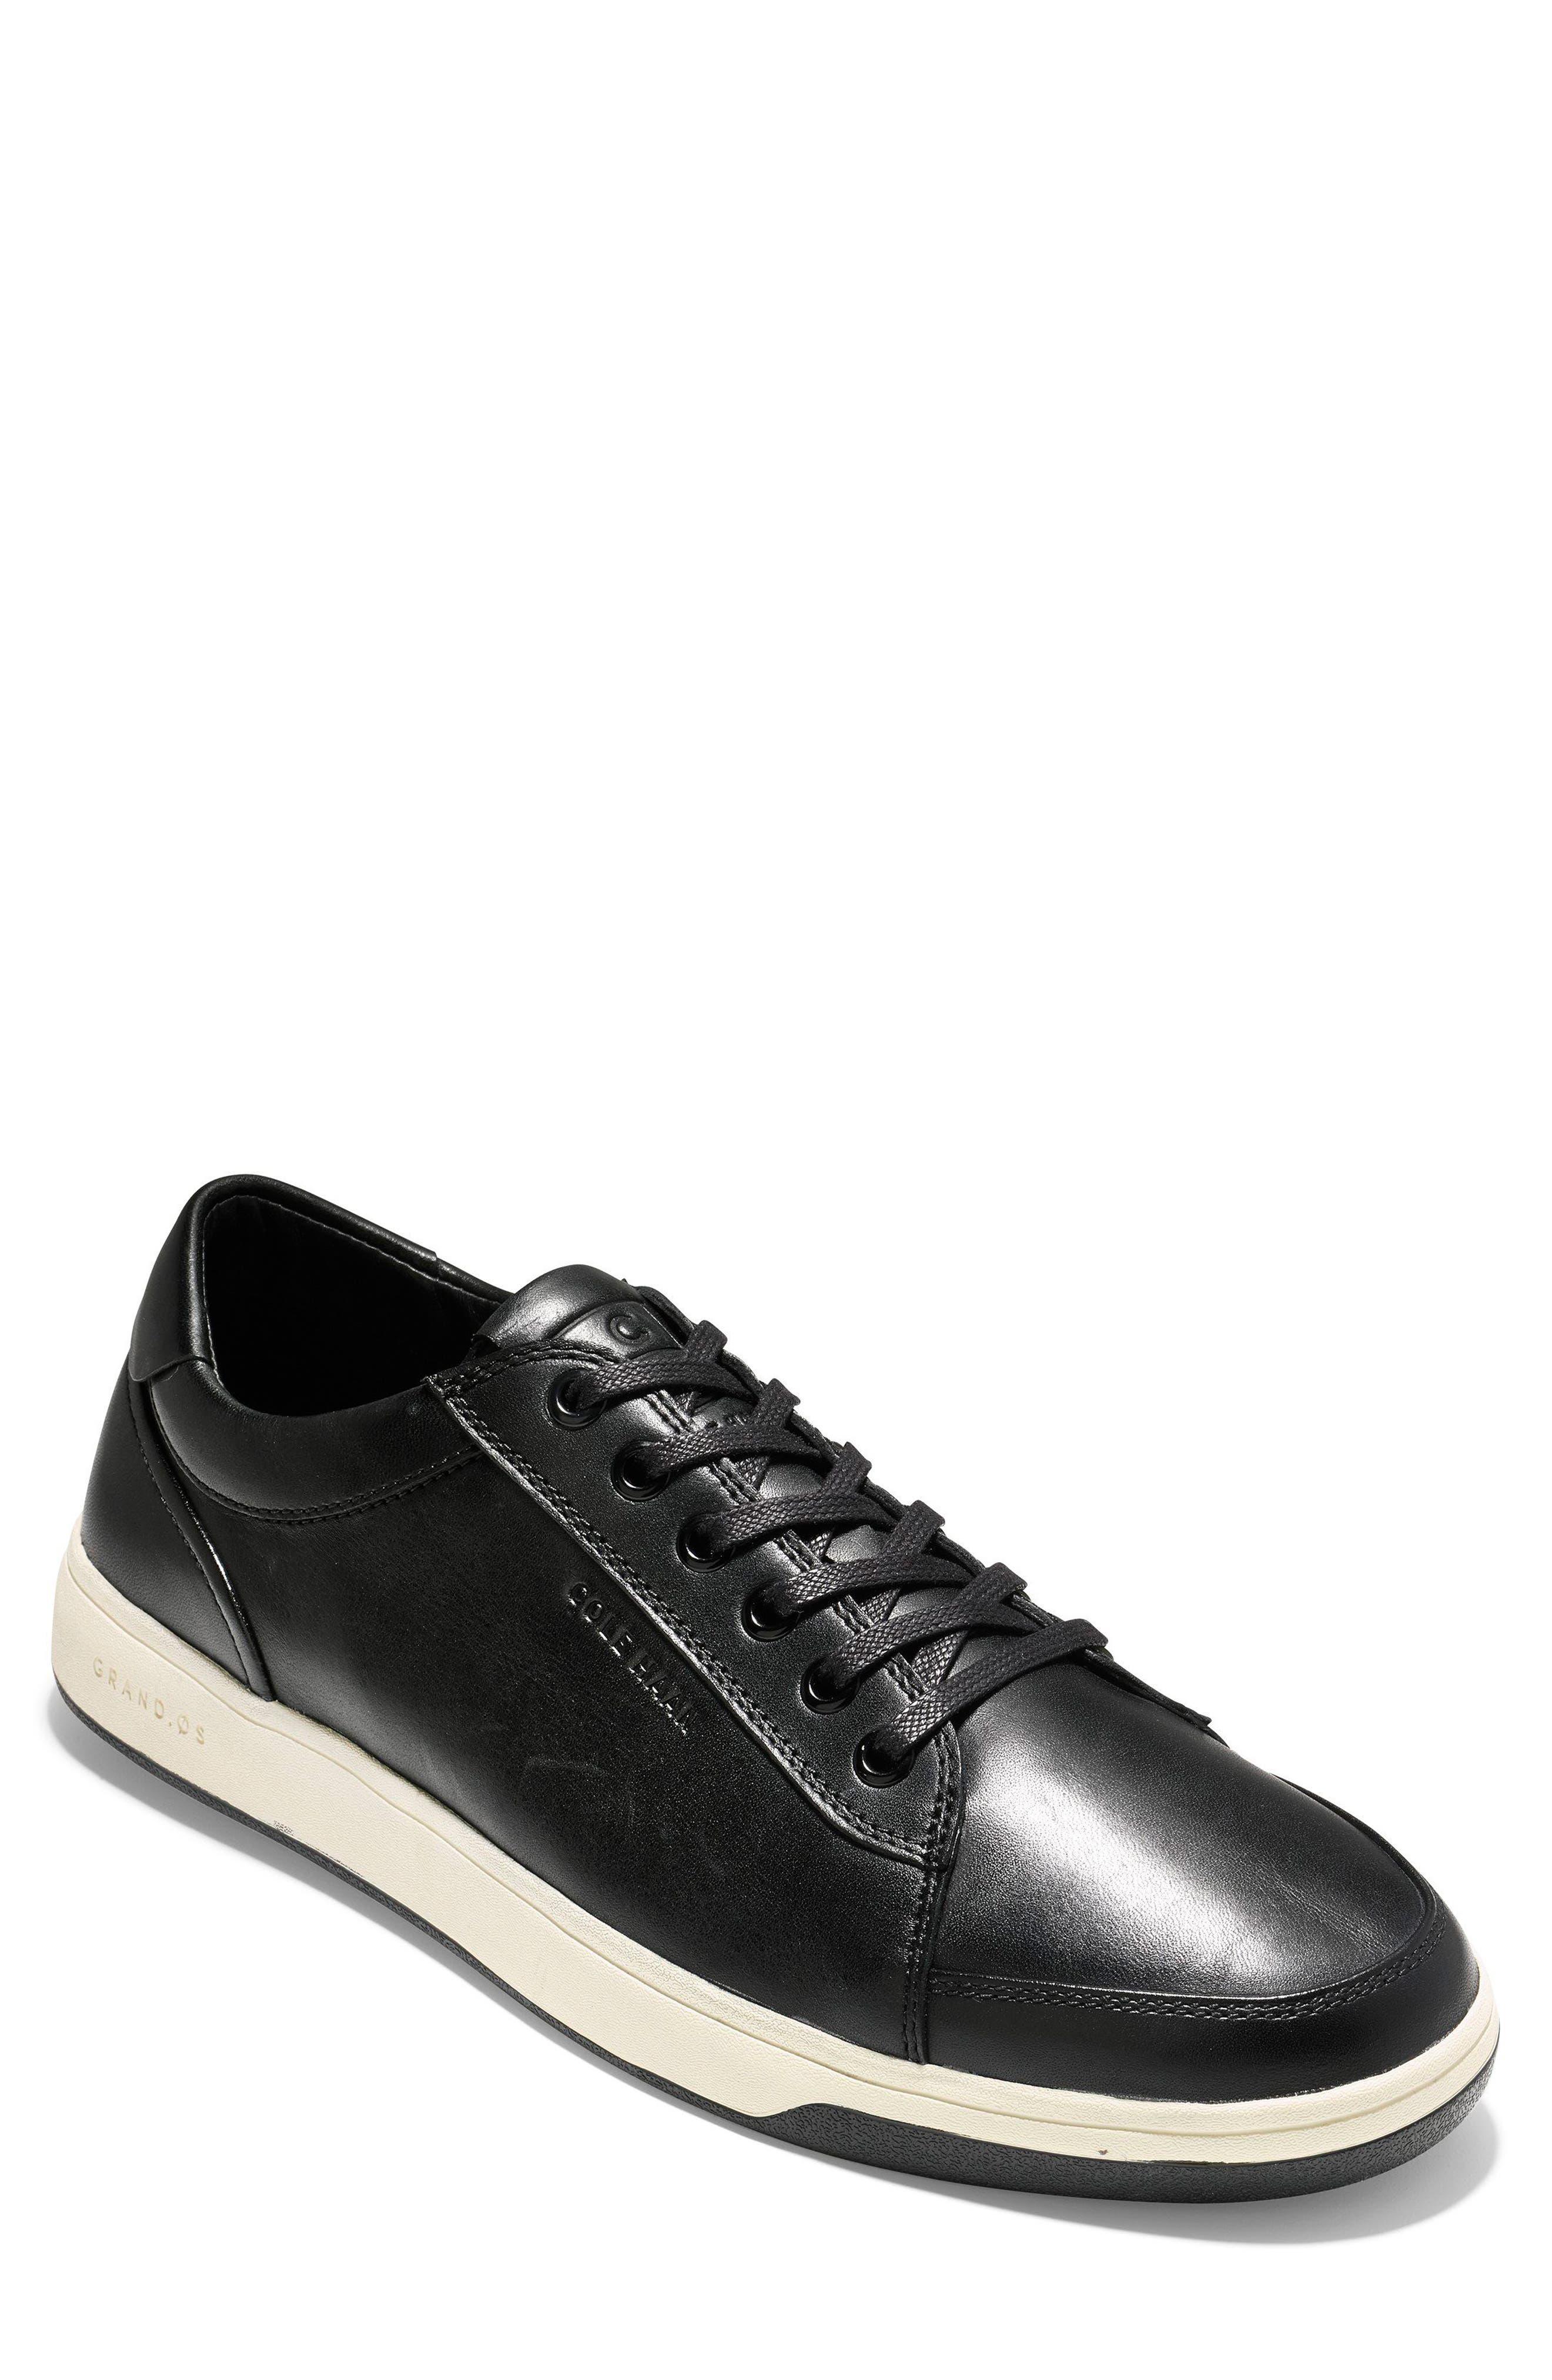 GrandPro Spectator Sneaker,                             Main thumbnail 1, color,                             001